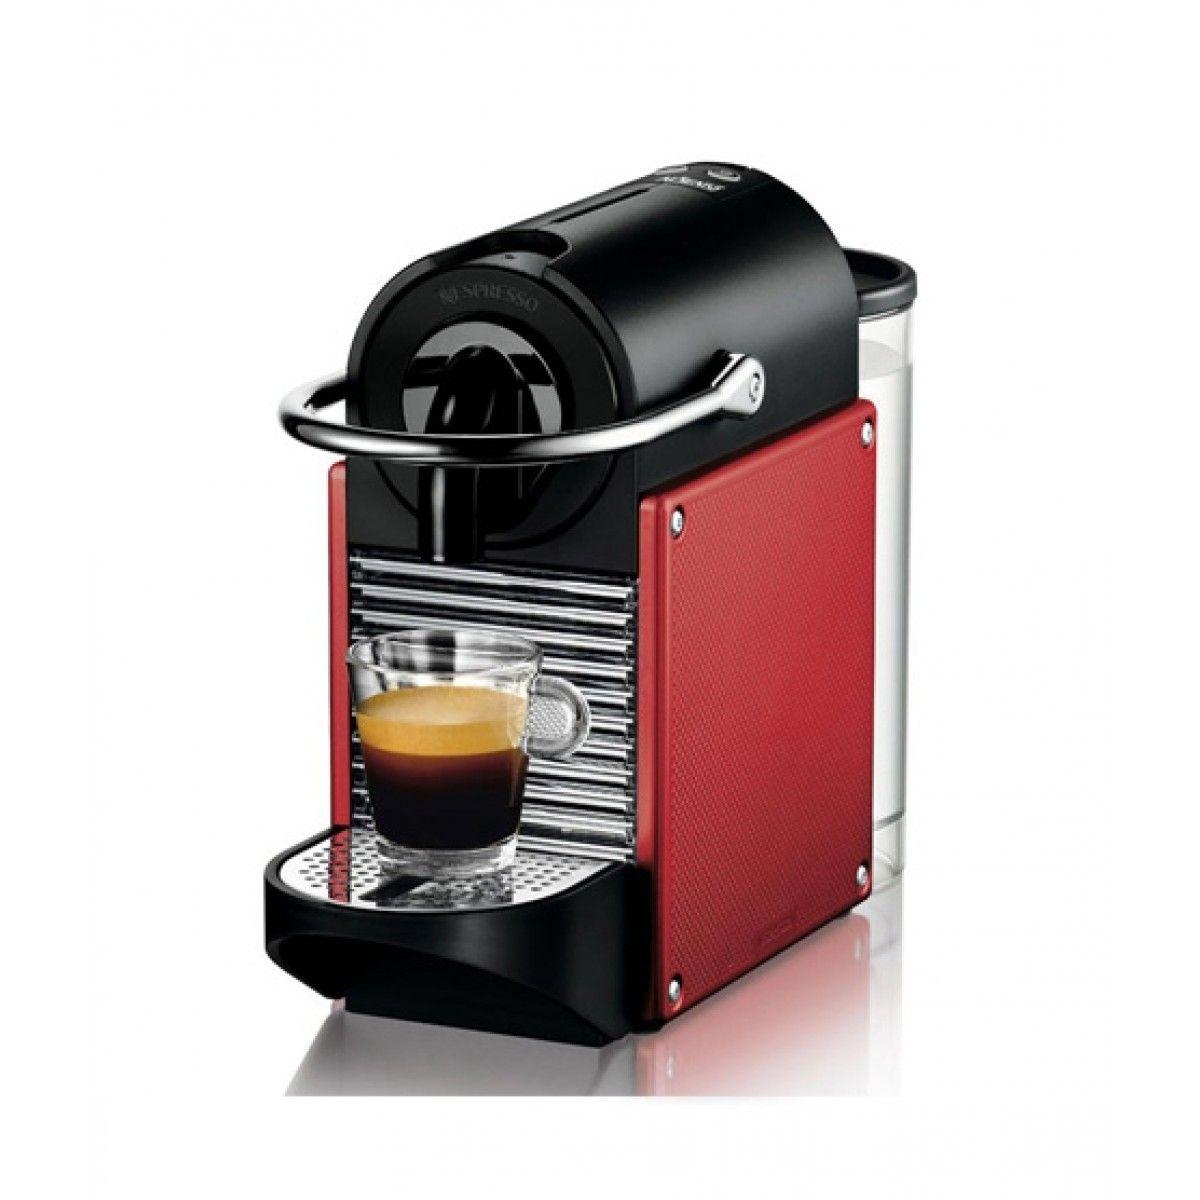 Delonghi Coffee Machine (EN-125.R)